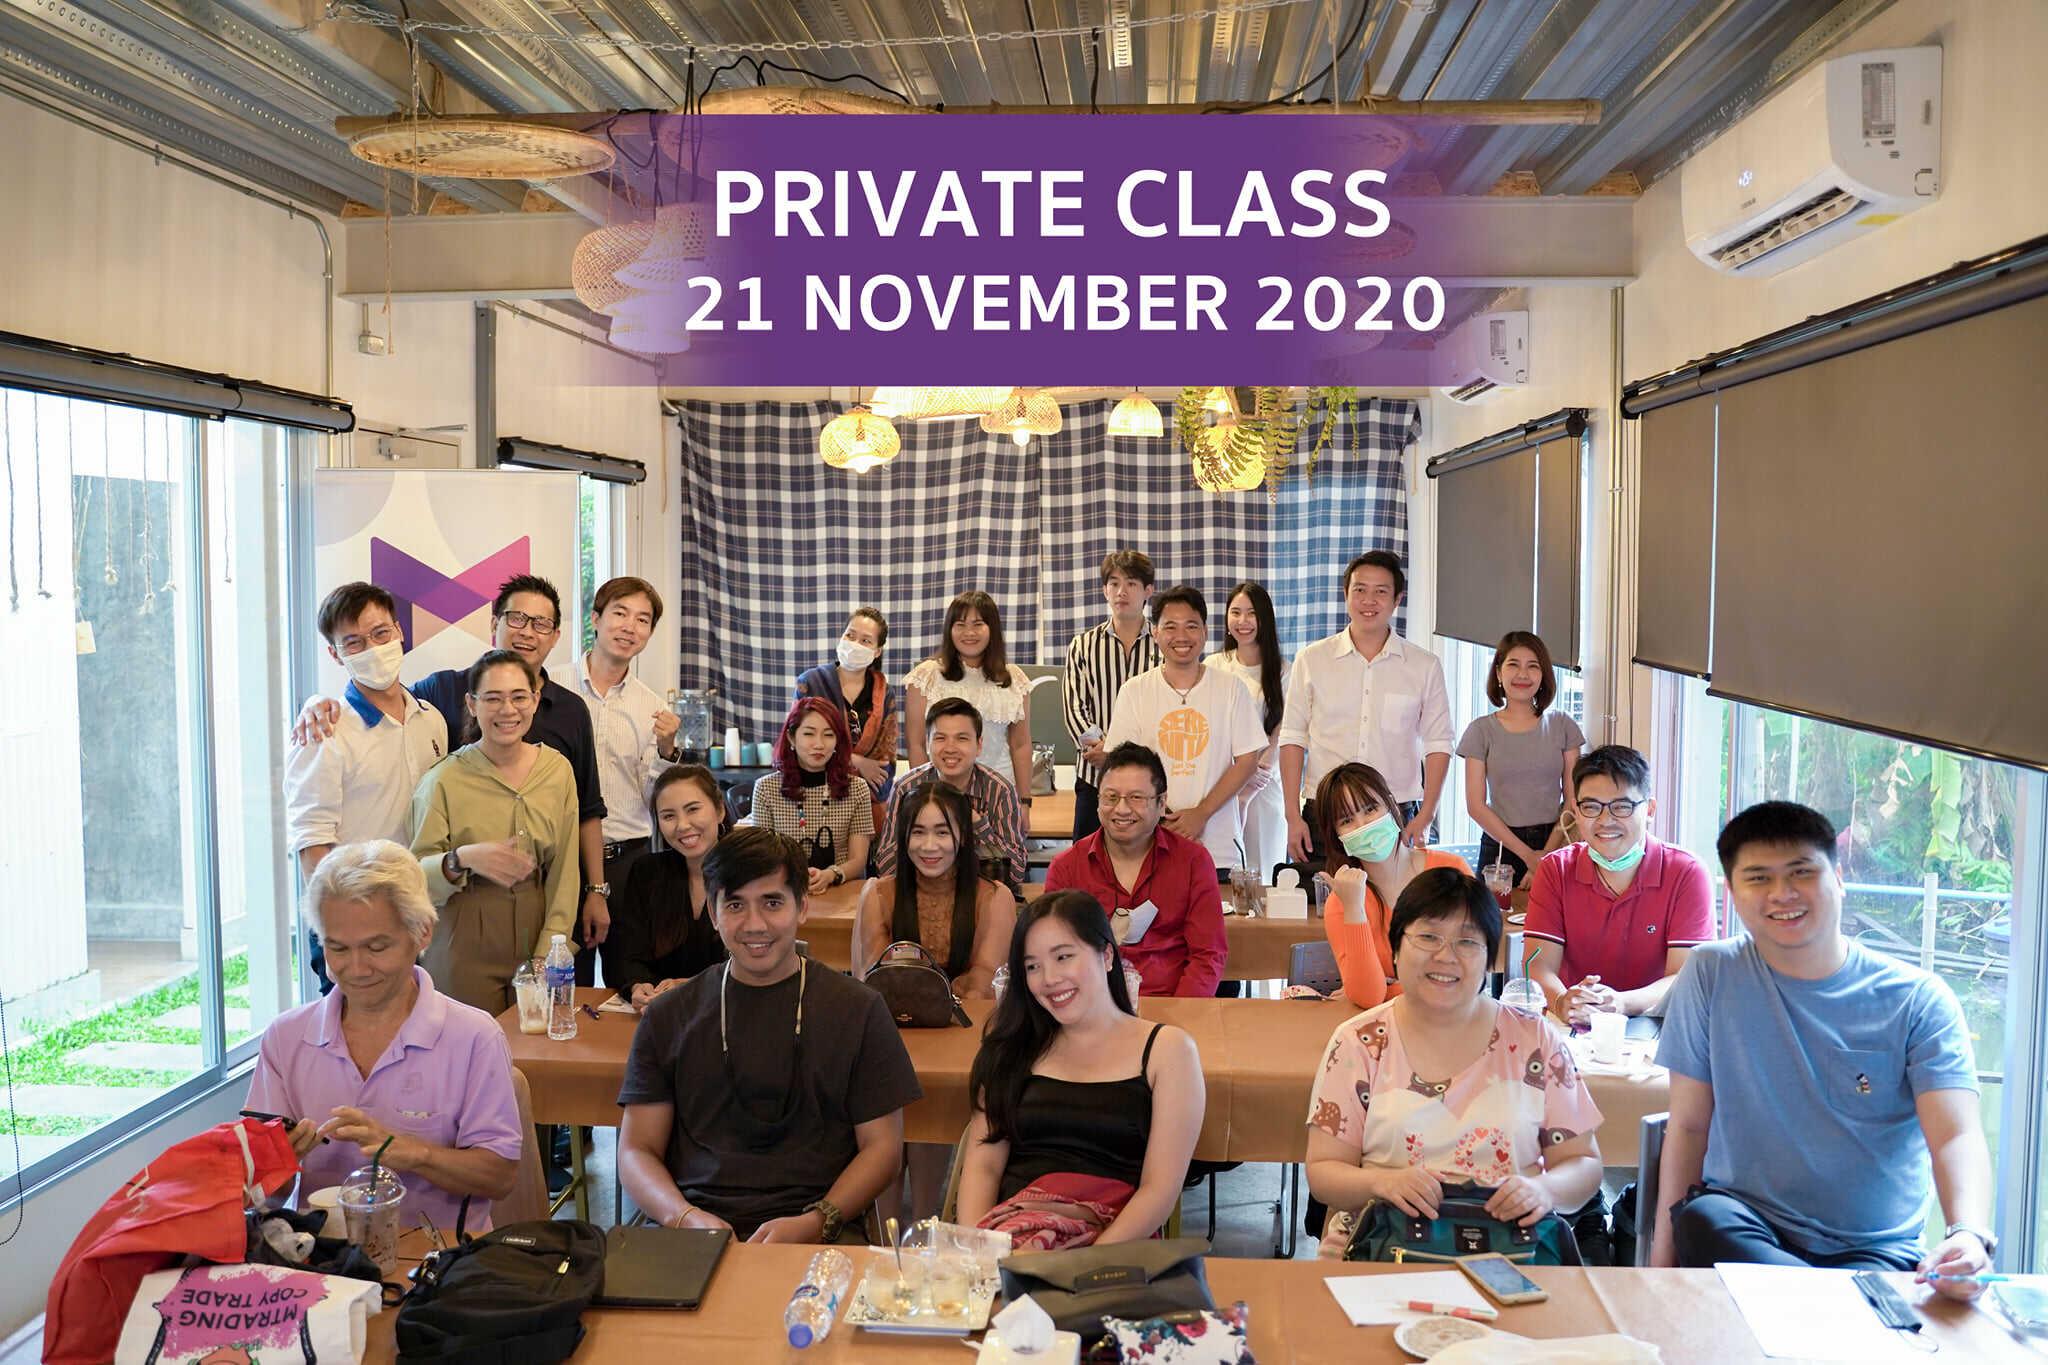 Private Class ครั้งแรกของ MTrading ณ กรุงเทพ